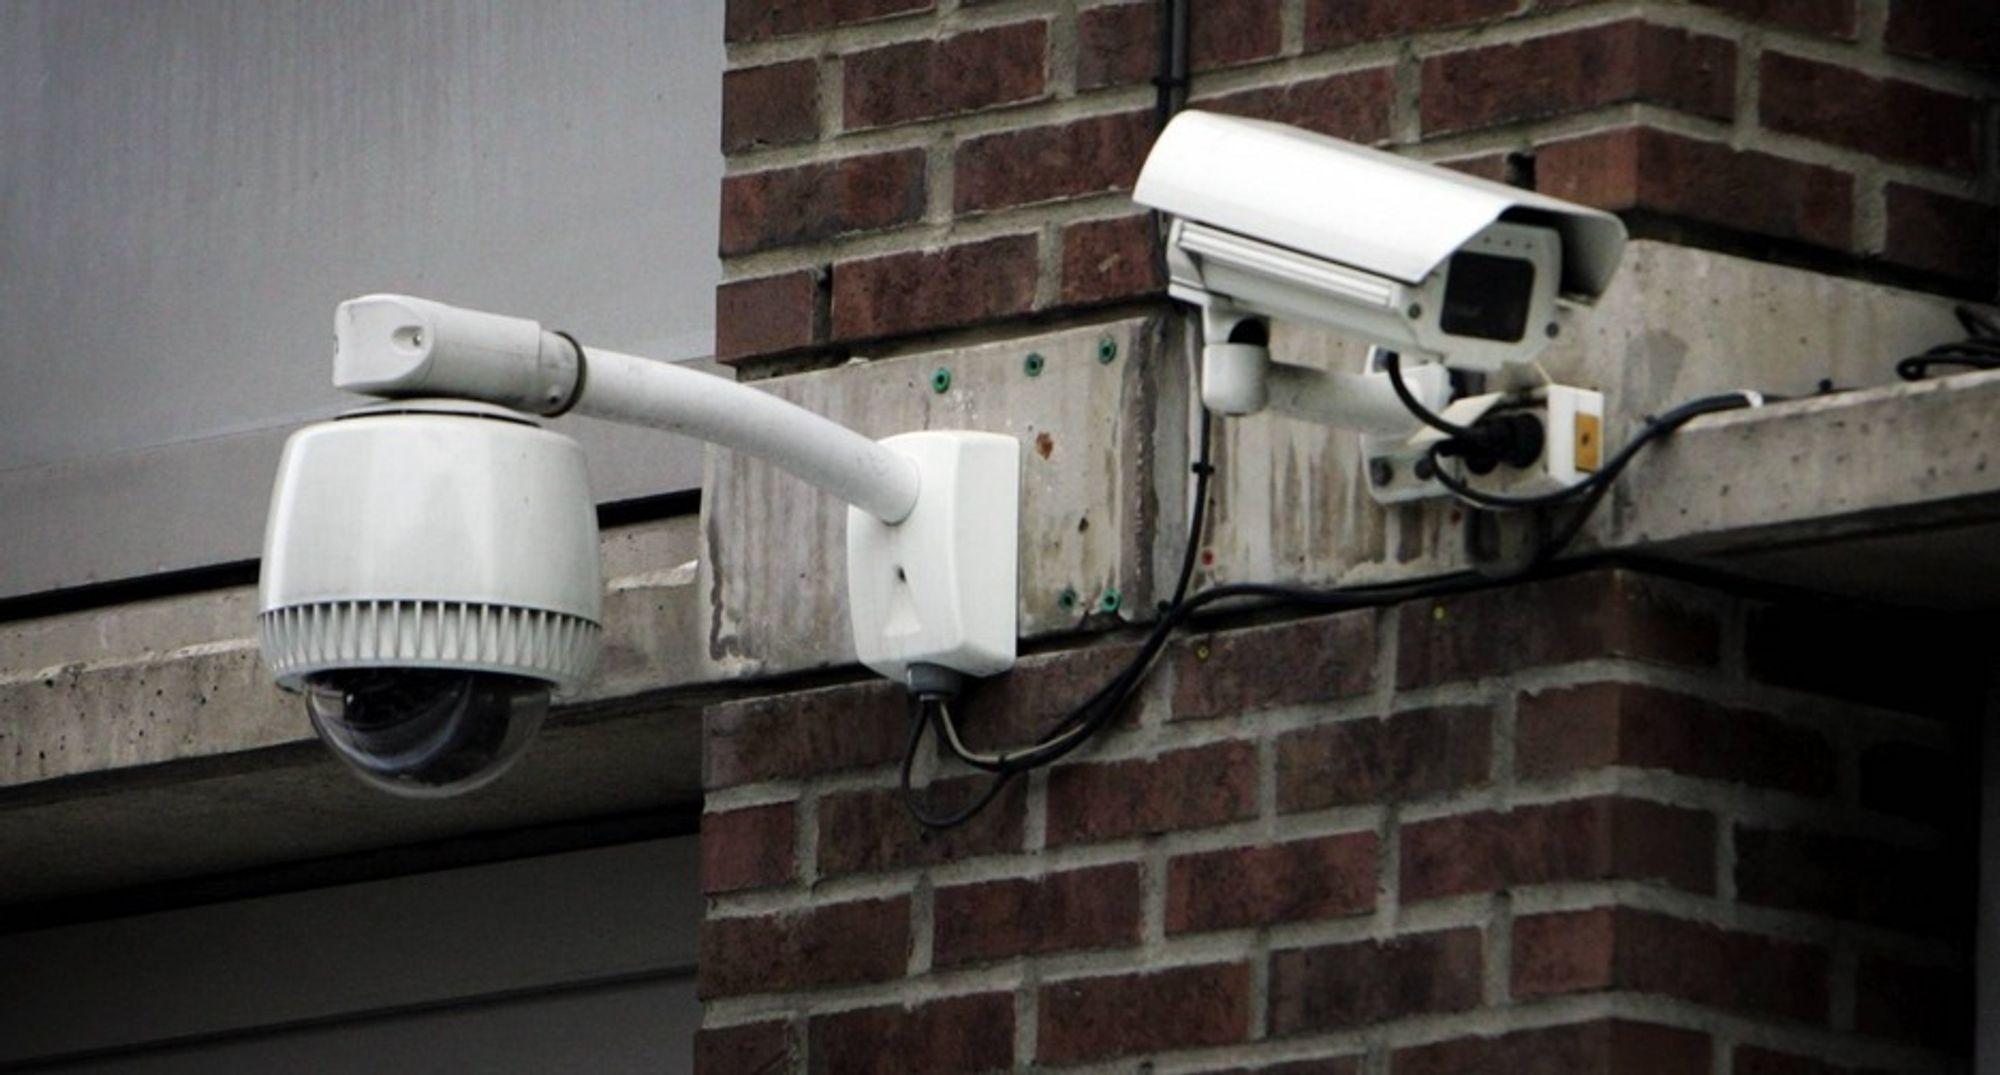 overvåking kamera